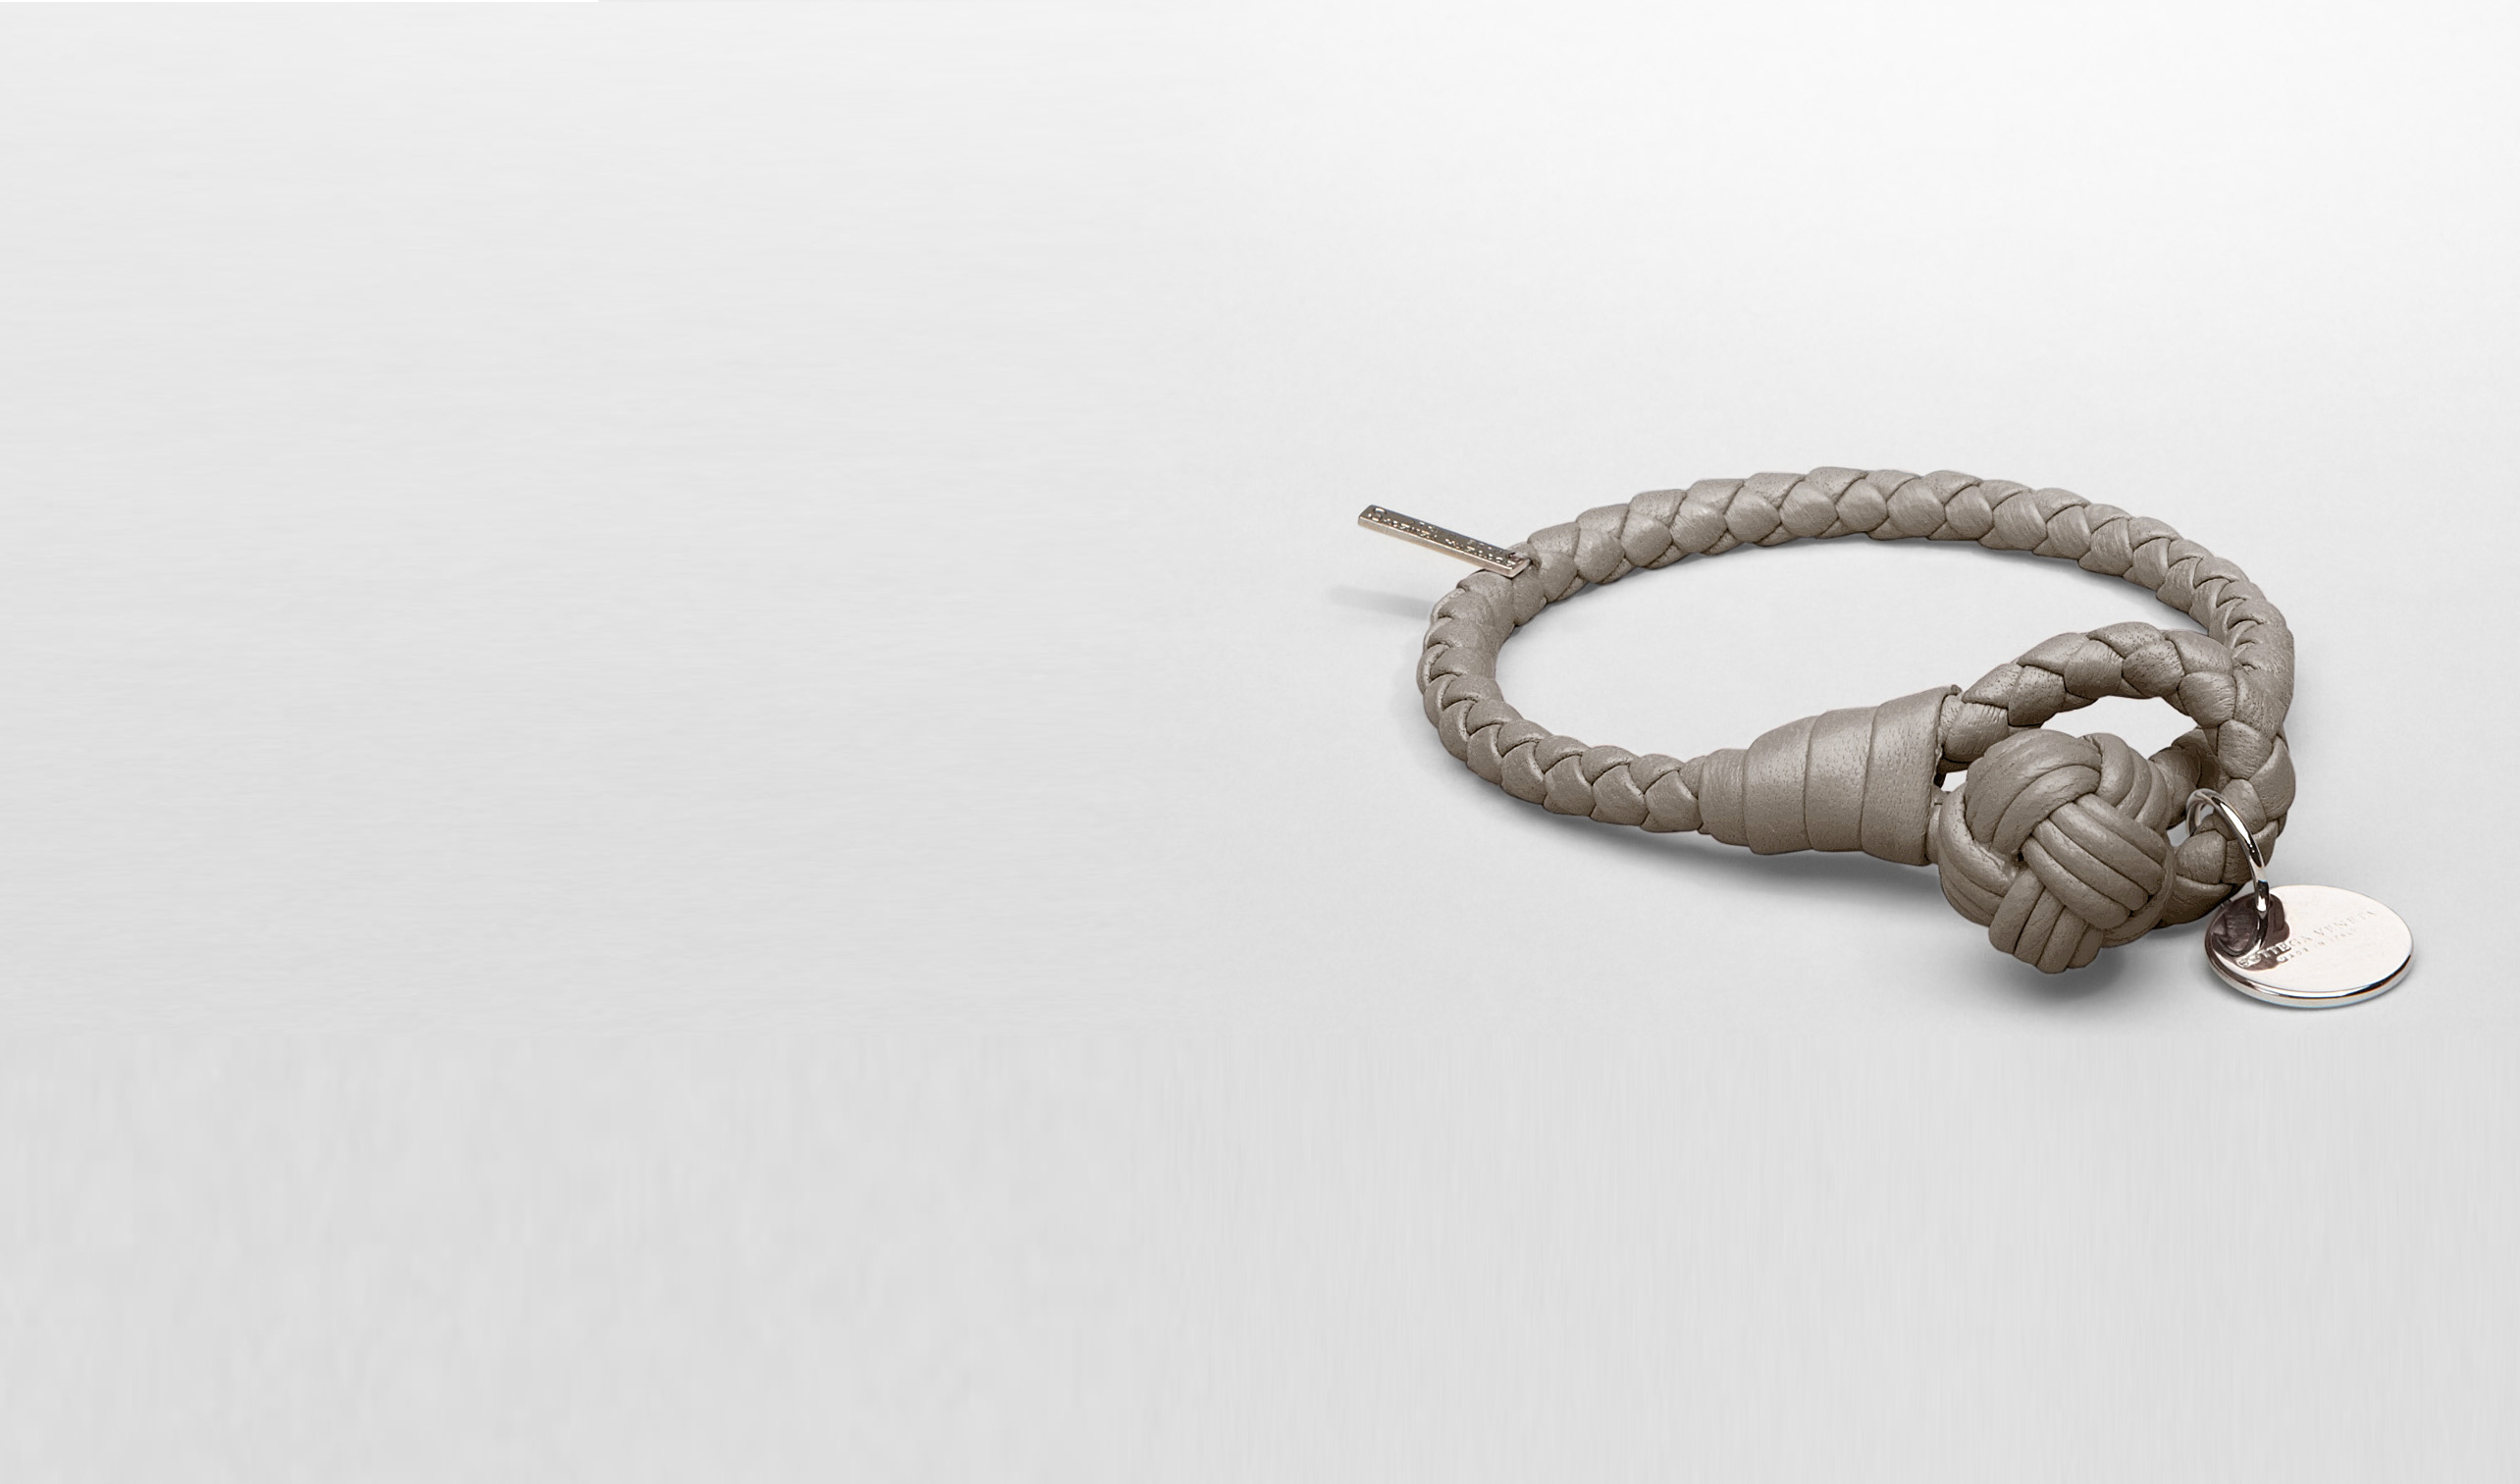 BOTTEGA VENETA Other Leather Accessory E Fume Intrecciato Nappa Bracelet pl